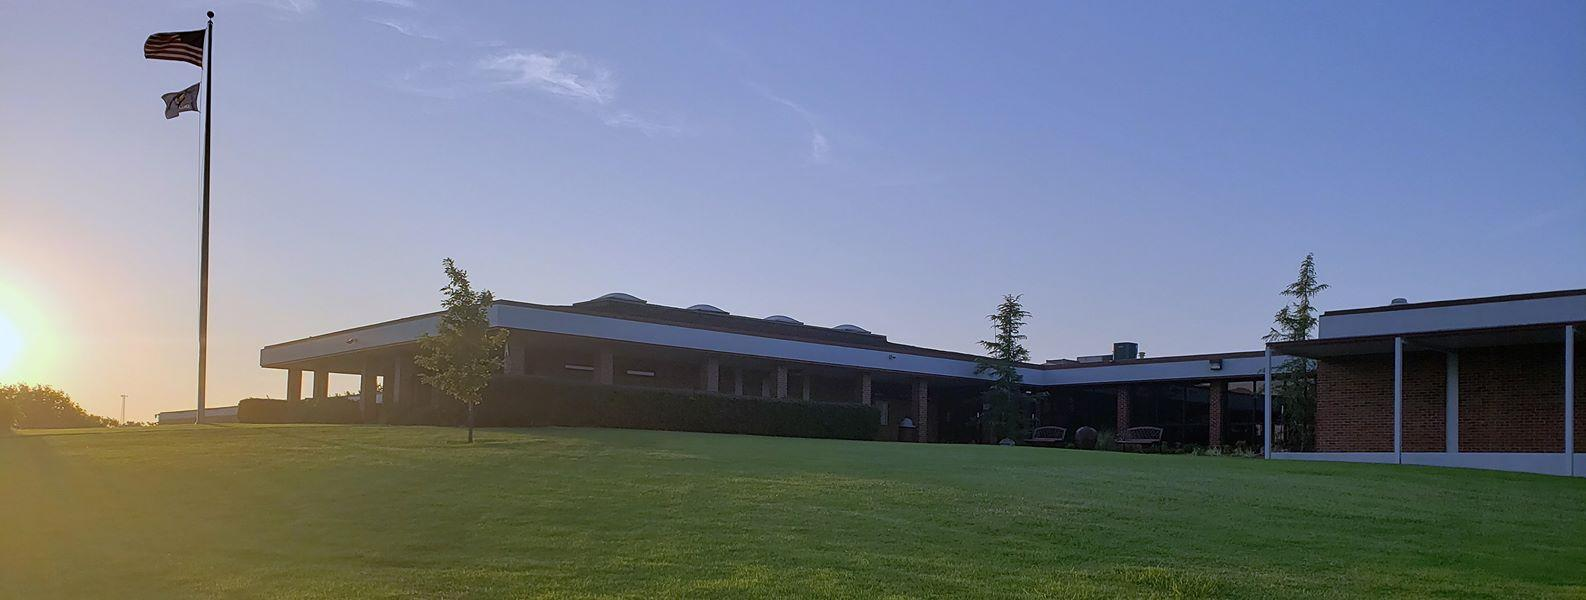 GCTC Shawnee Campus